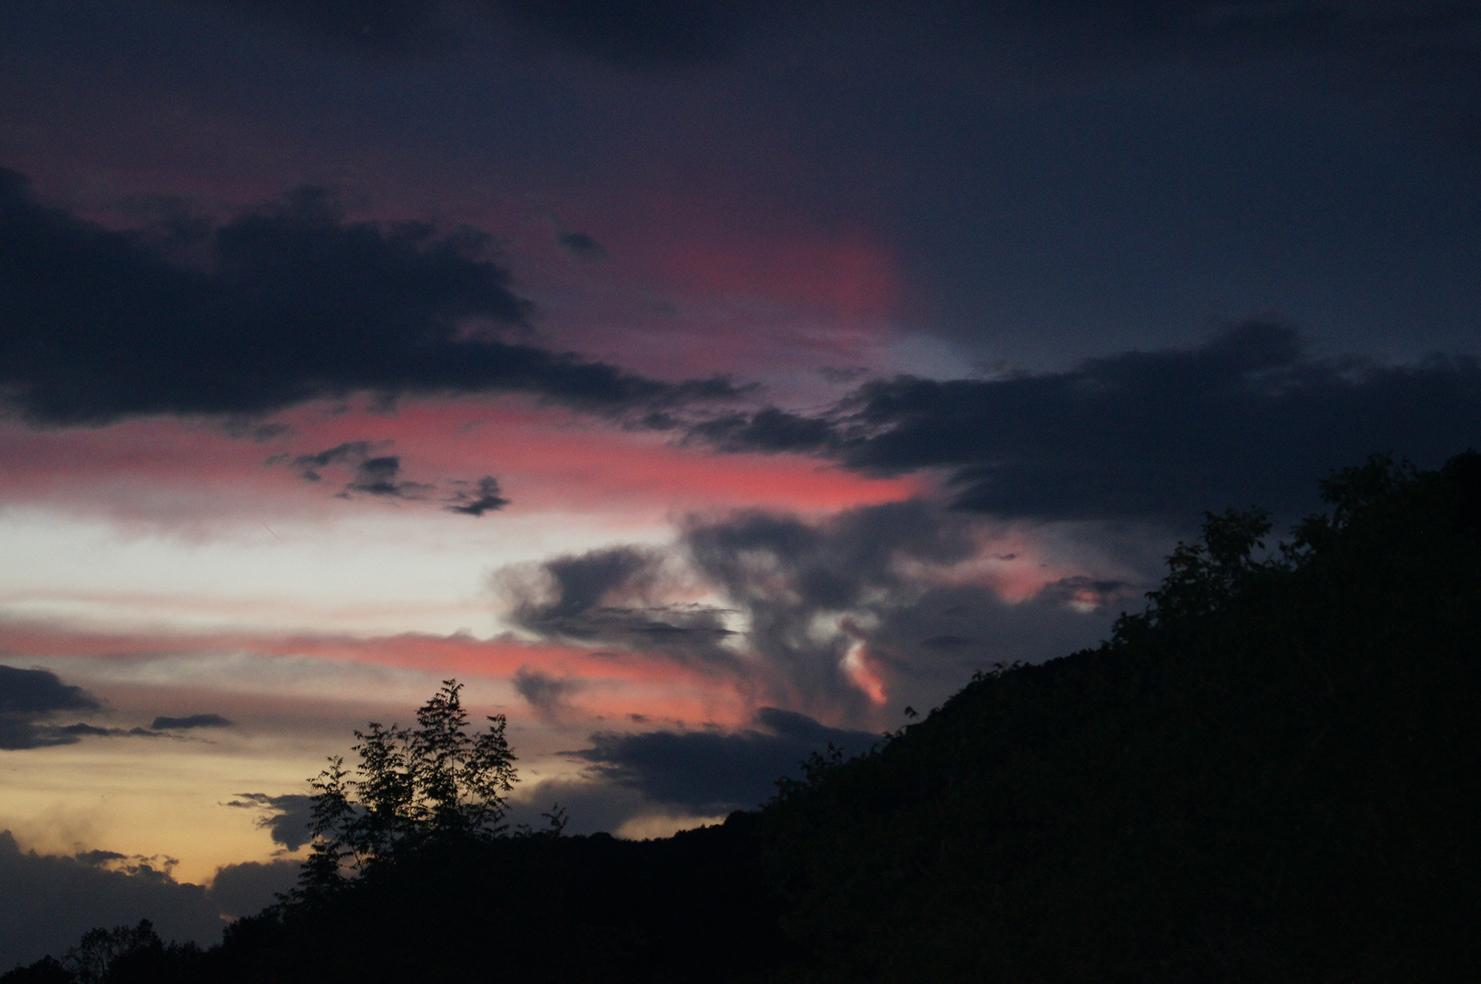 Blau-rotes Himmelsdrama